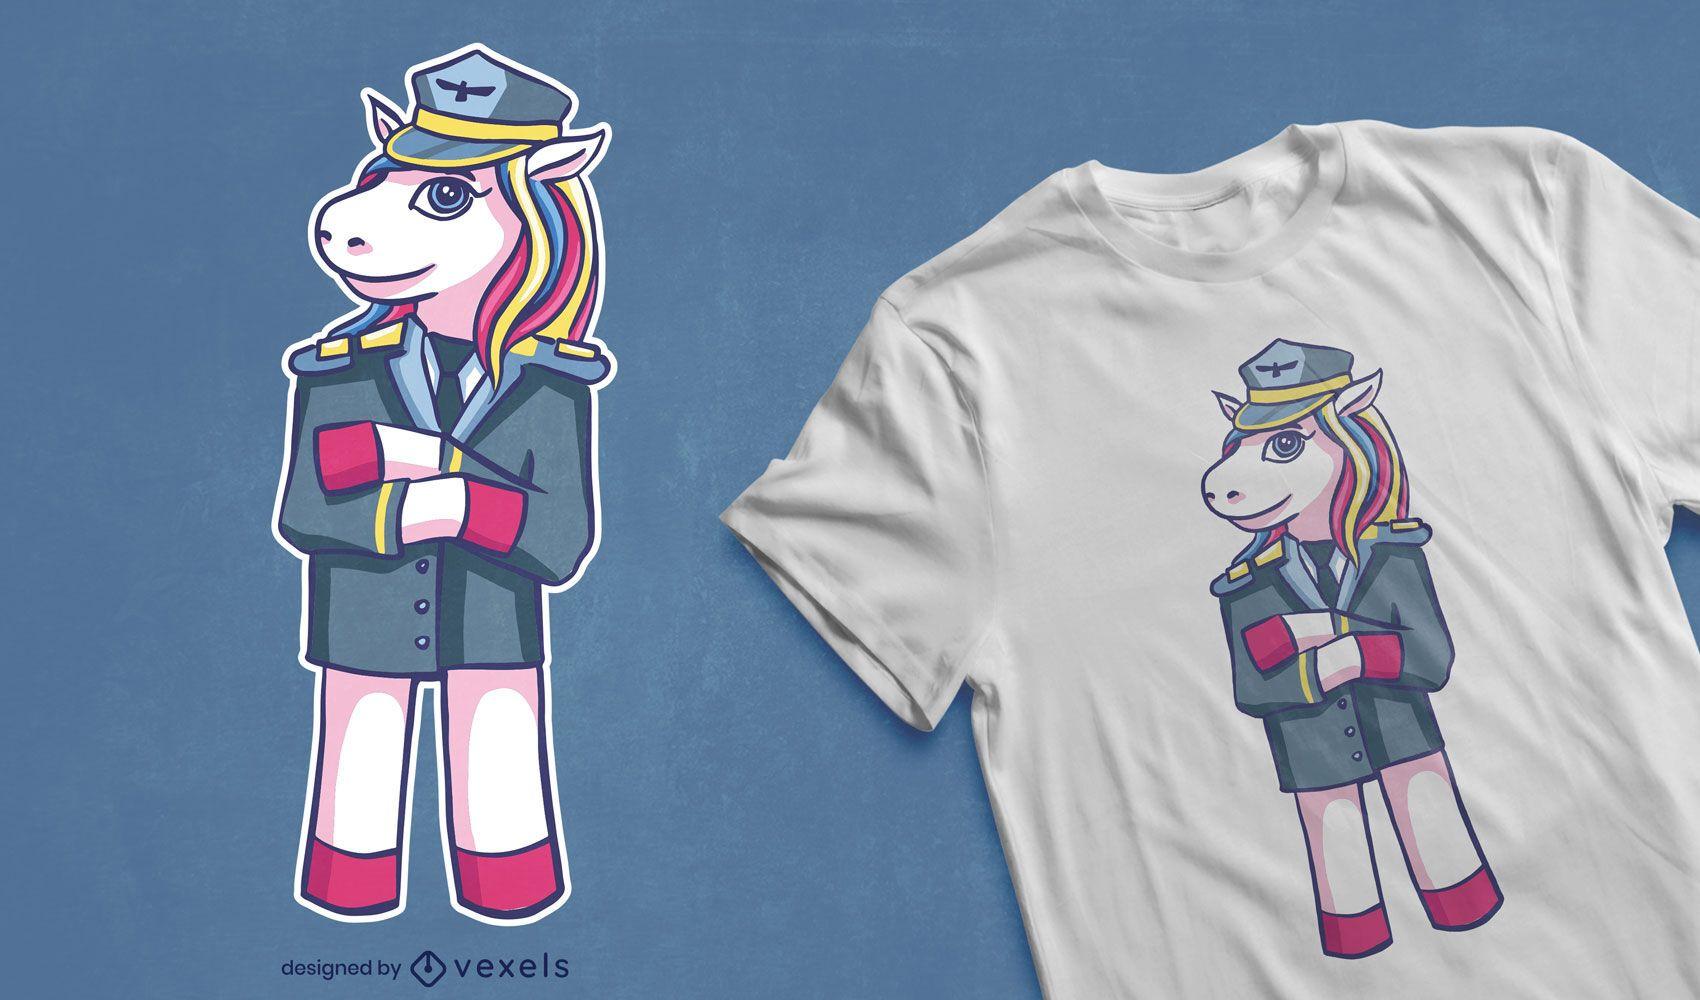 Dise?o de camiseta piloto unicornio.